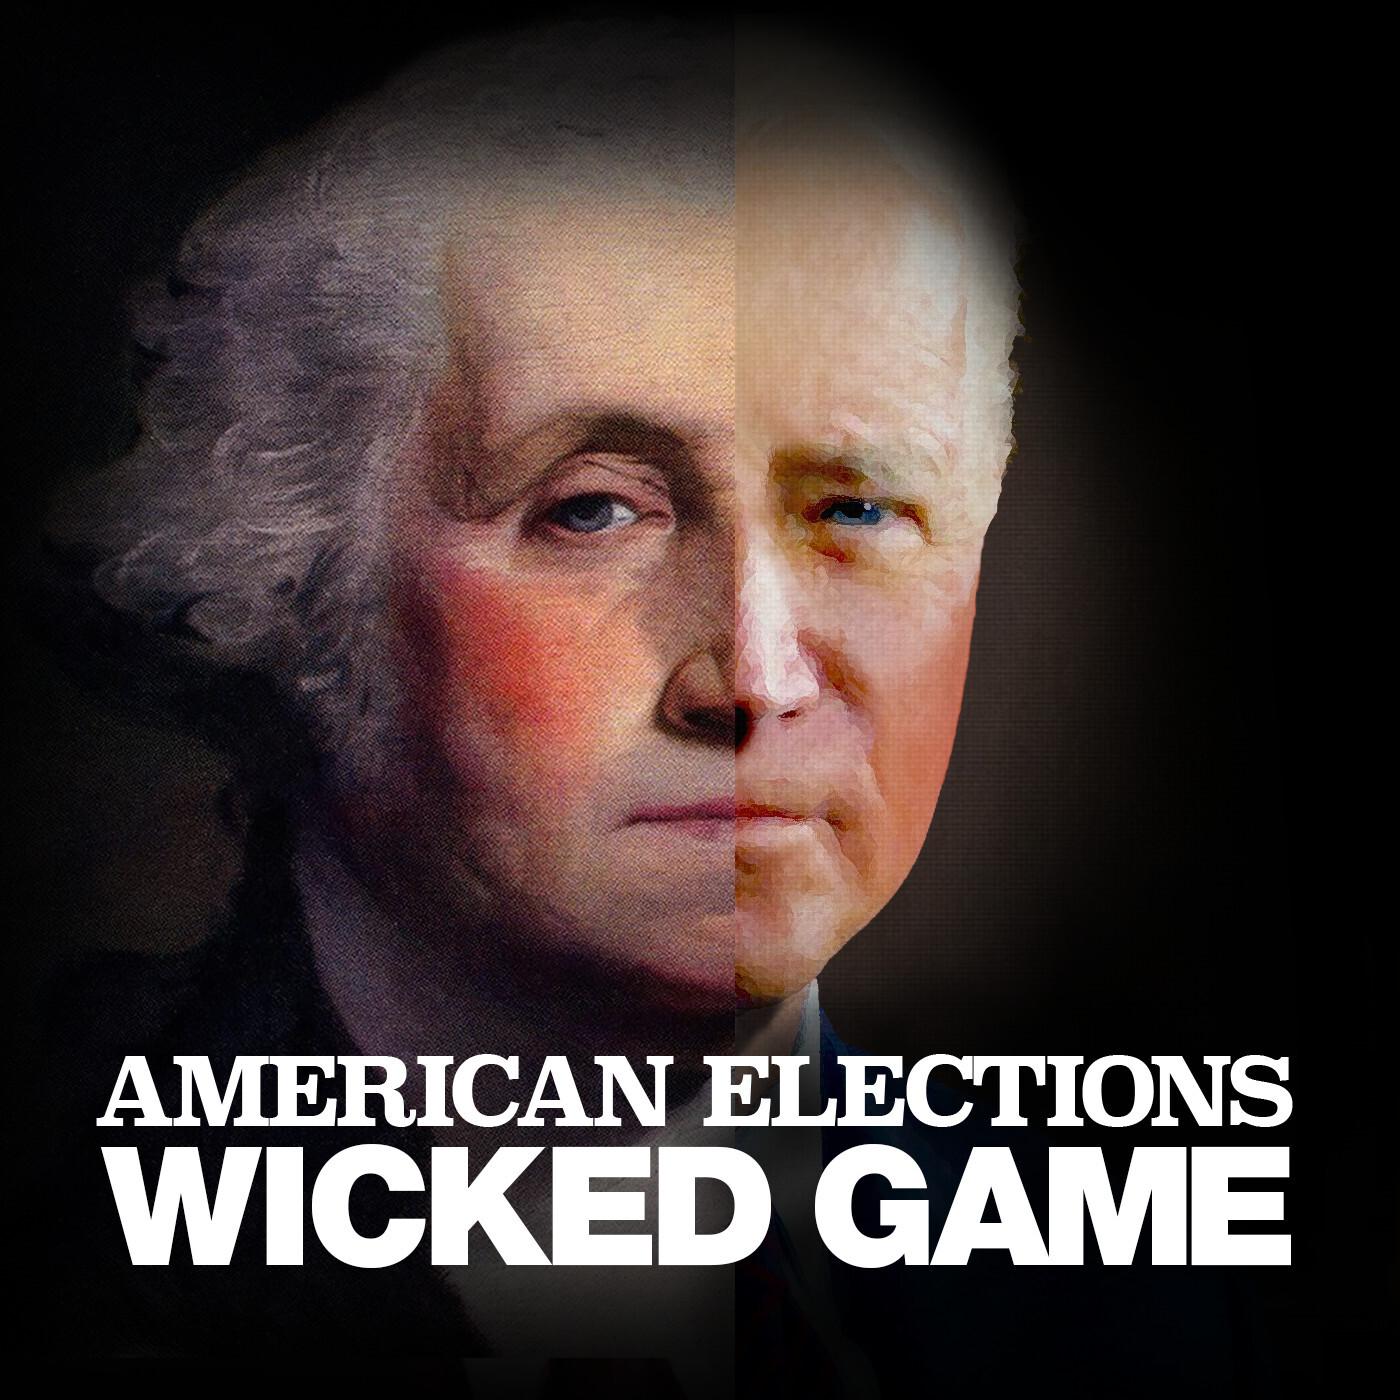 2008, McCain vs. Obama: Hope and Change